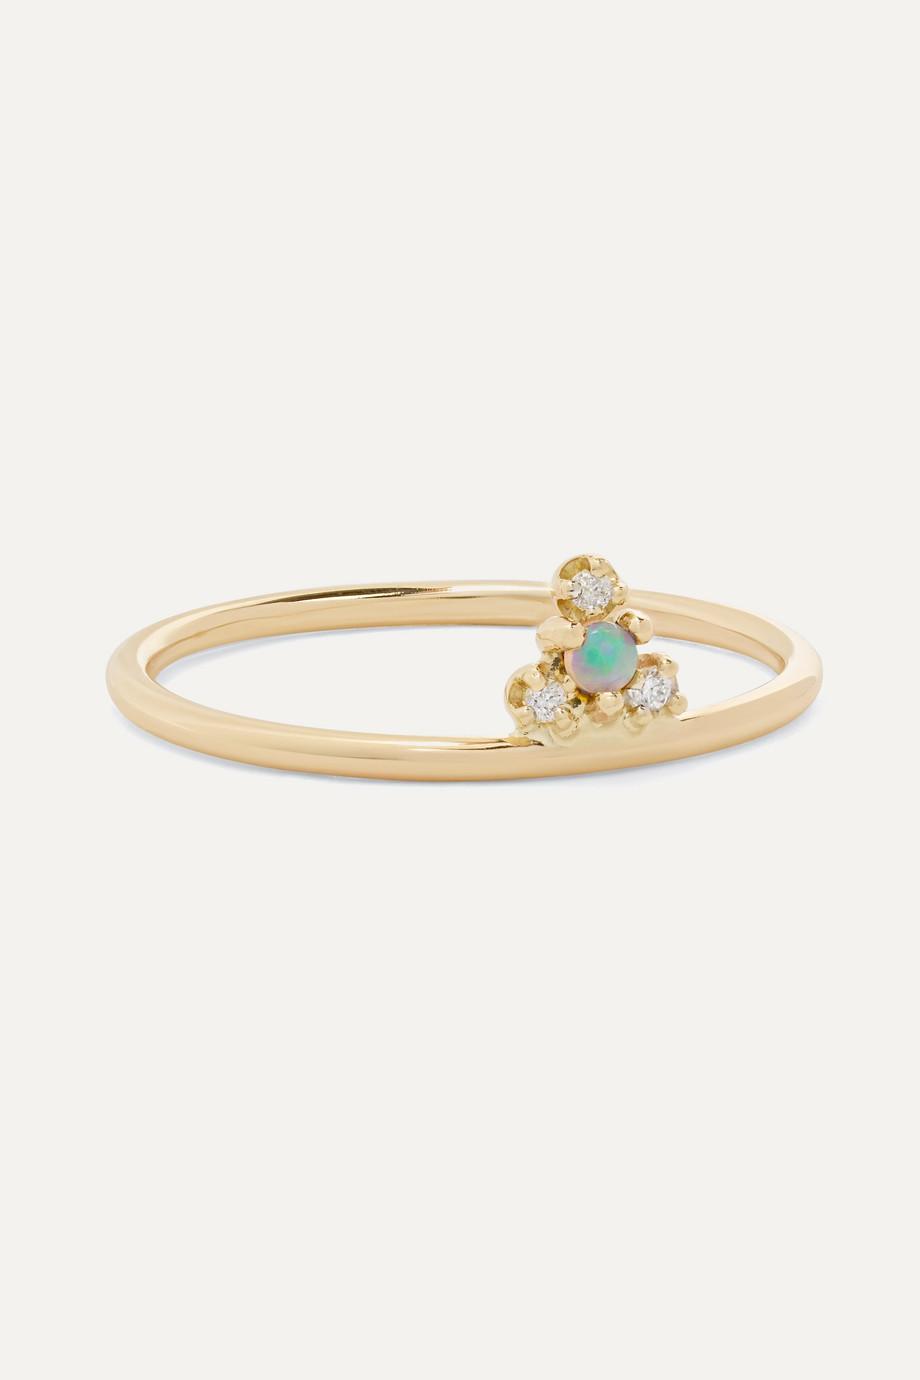 Wwake + NET SUSTAIN Burst gold, opal and diamond ring